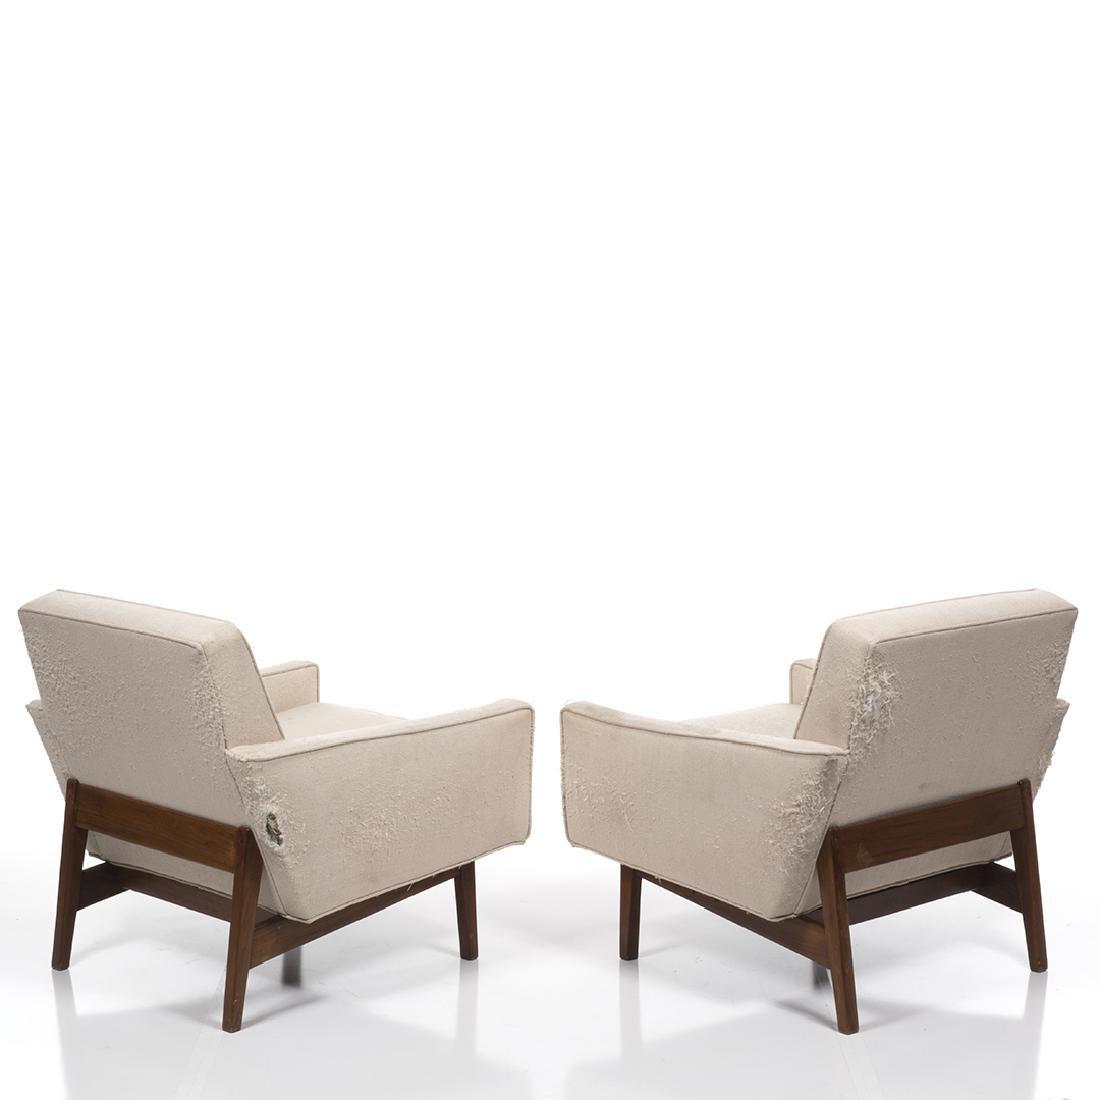 Jens Risom Lounge Chairs (2) - 3